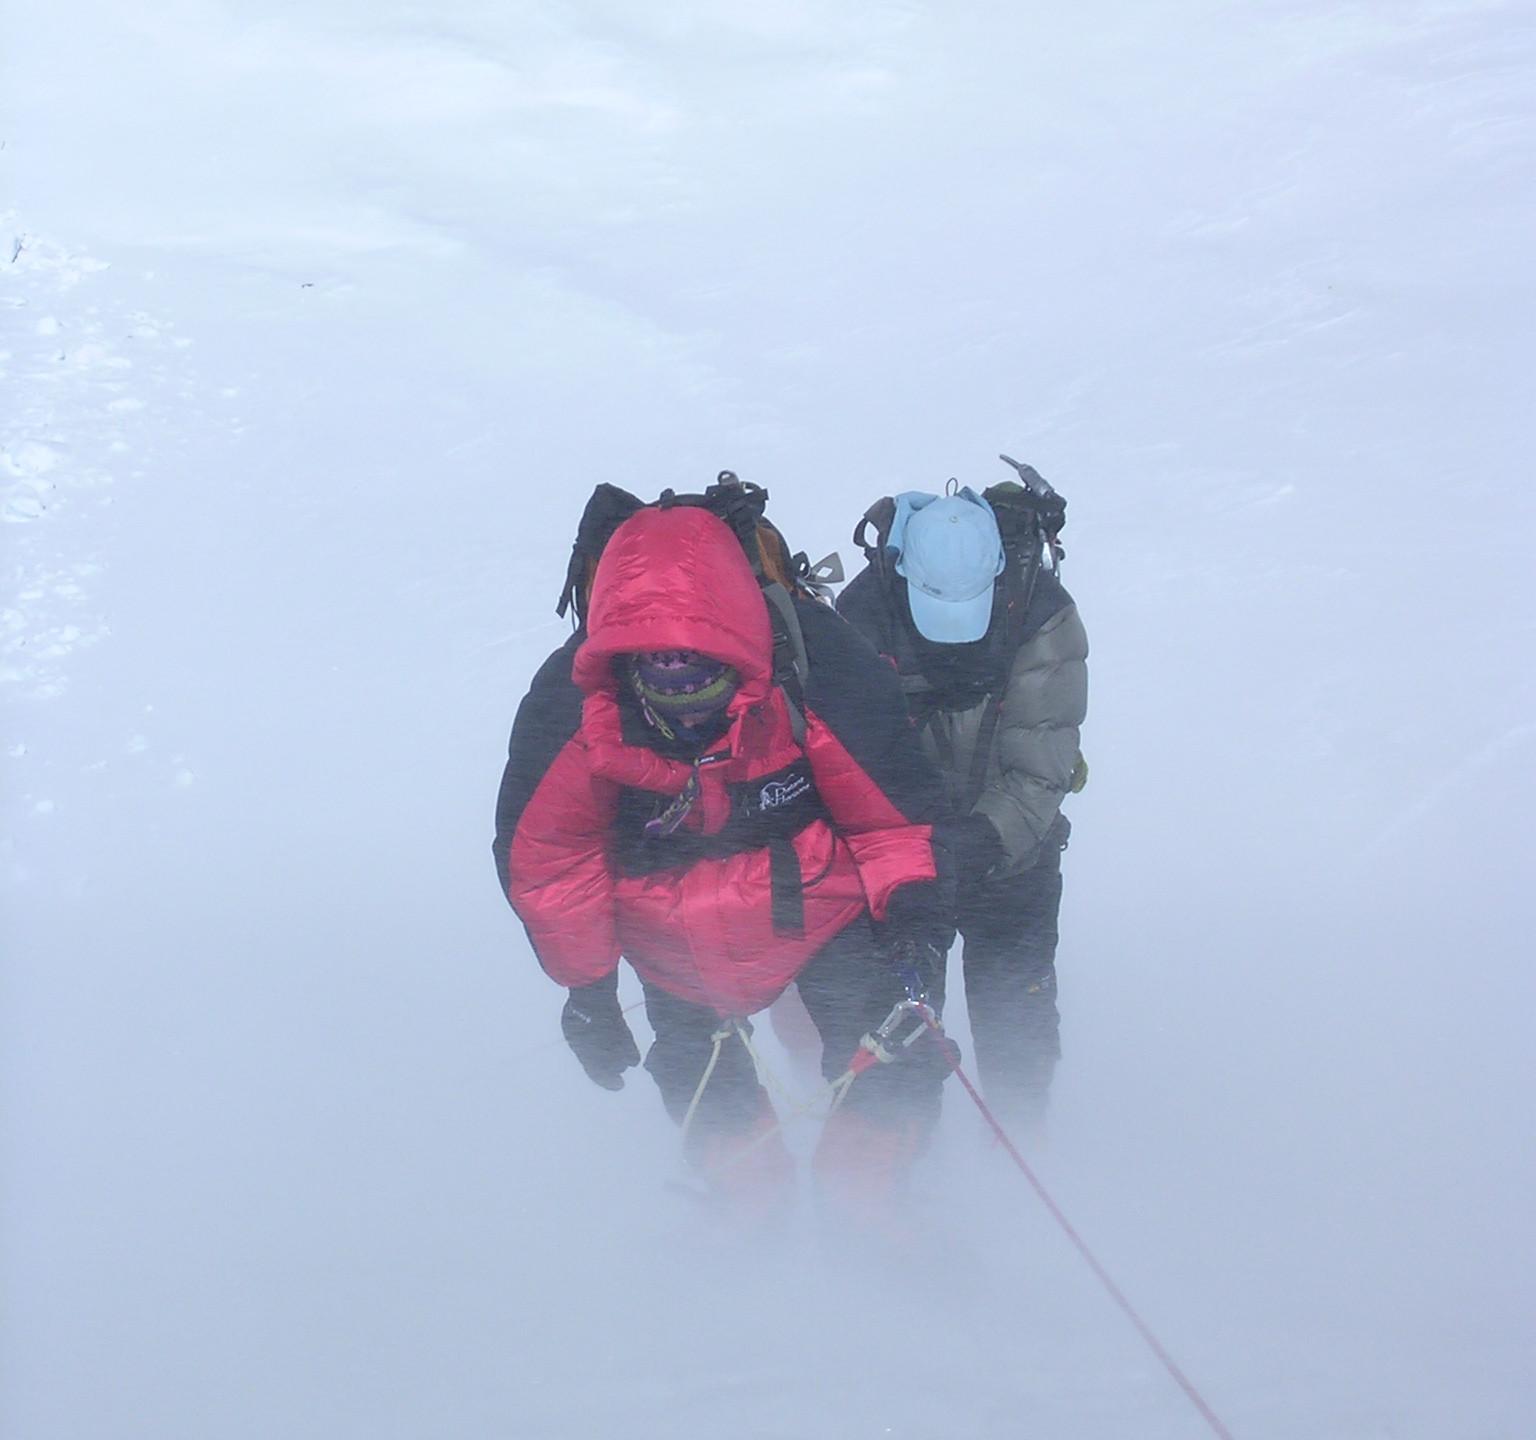 Climbing the Lhotse face